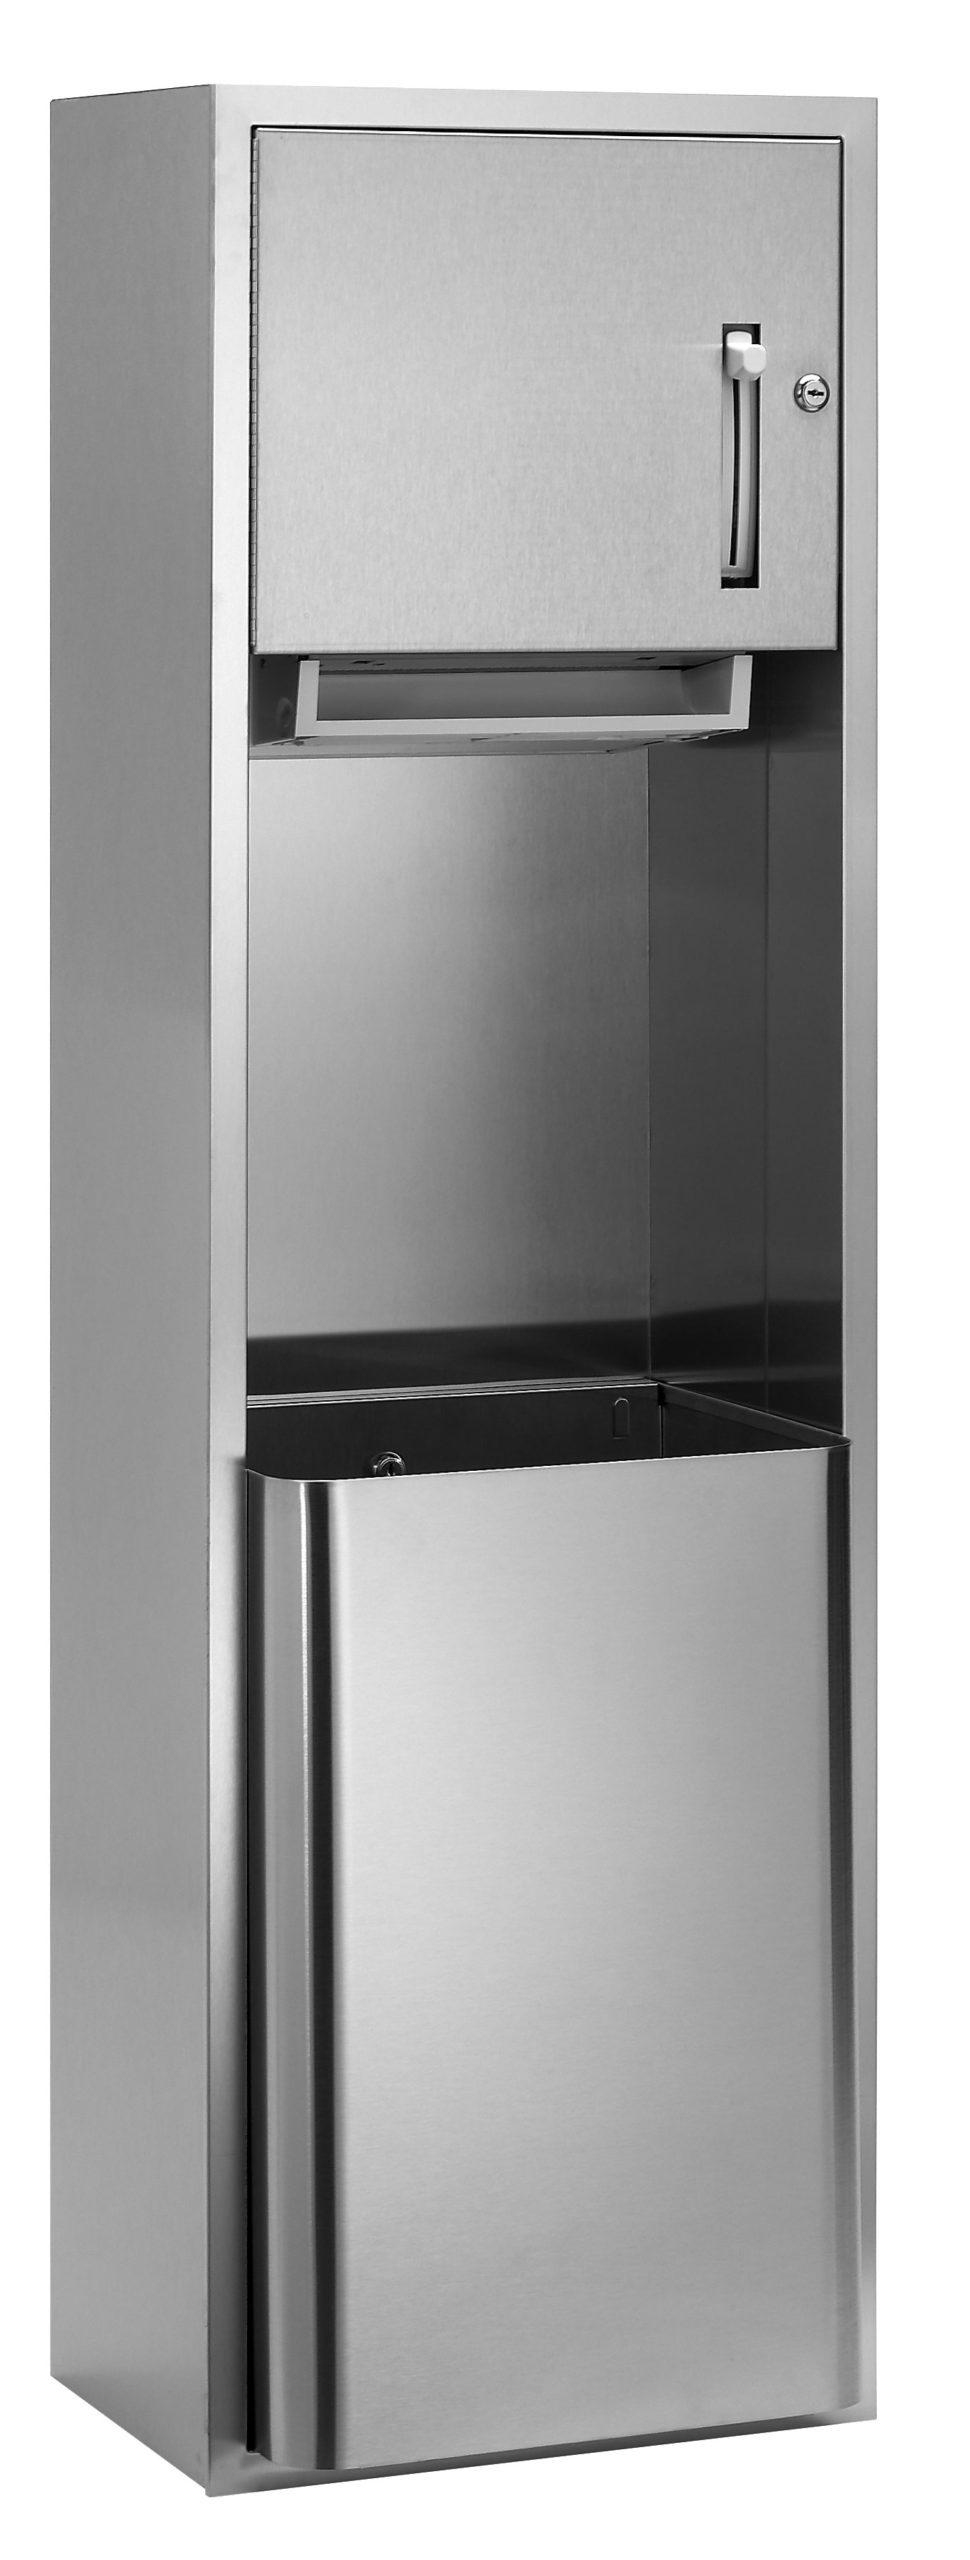 Bradley 227-11 Surface-Mounted Roll Towel Dispenser & 18 gal. Waste Receptacle